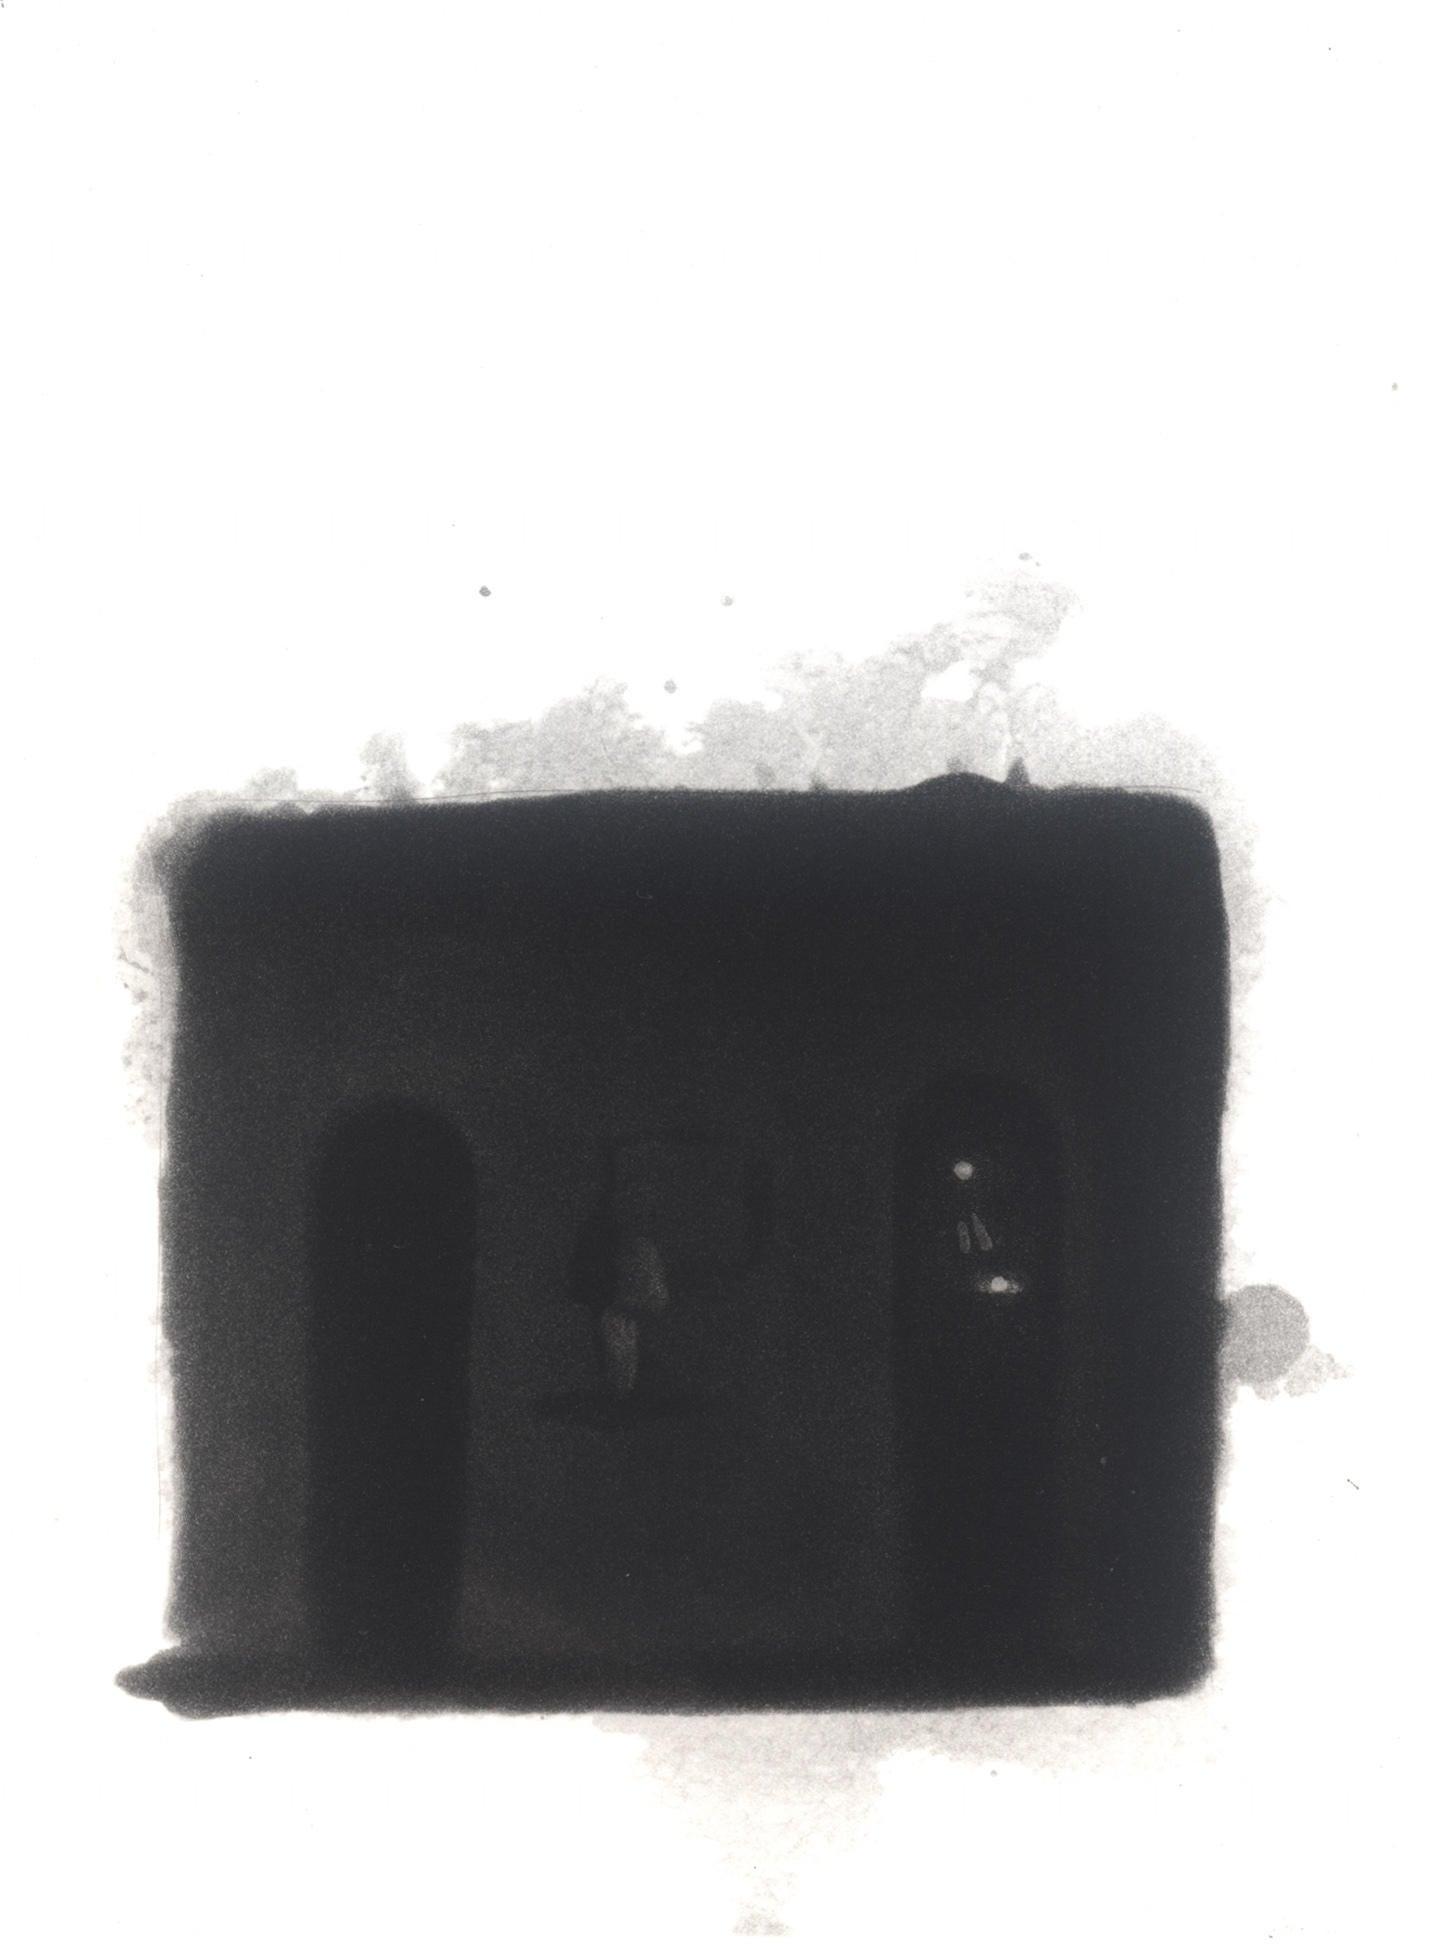 VIII. Interior image